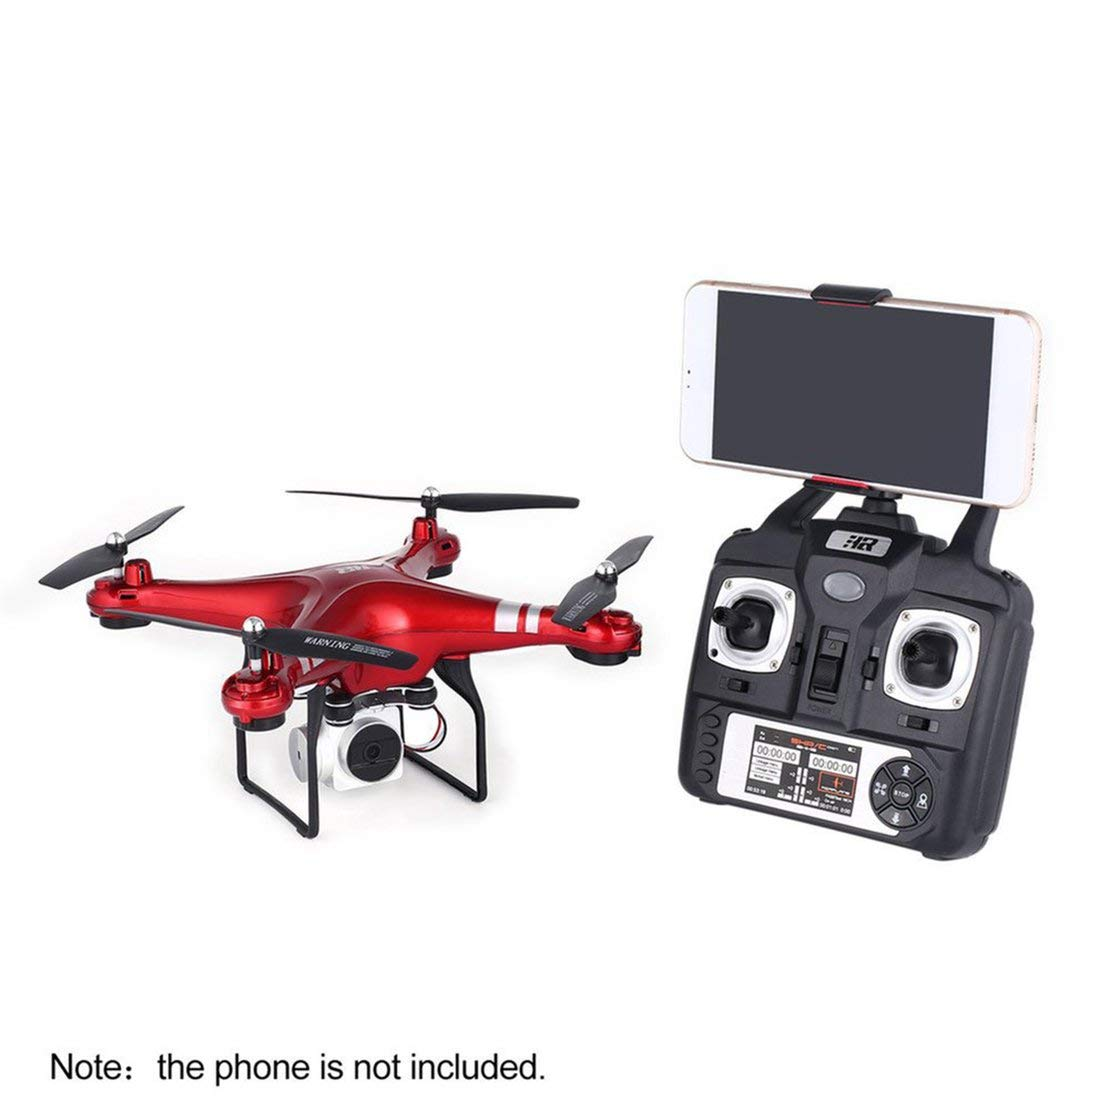 Hermosairis SH5H 2.4g FPV-Drohne mit 1080p-Weitwinkel-HD-Wifi-Kamera-Live-Video-Headless-Modus-Schwerkraft-Sense-Return-Taste RC Quadcopter